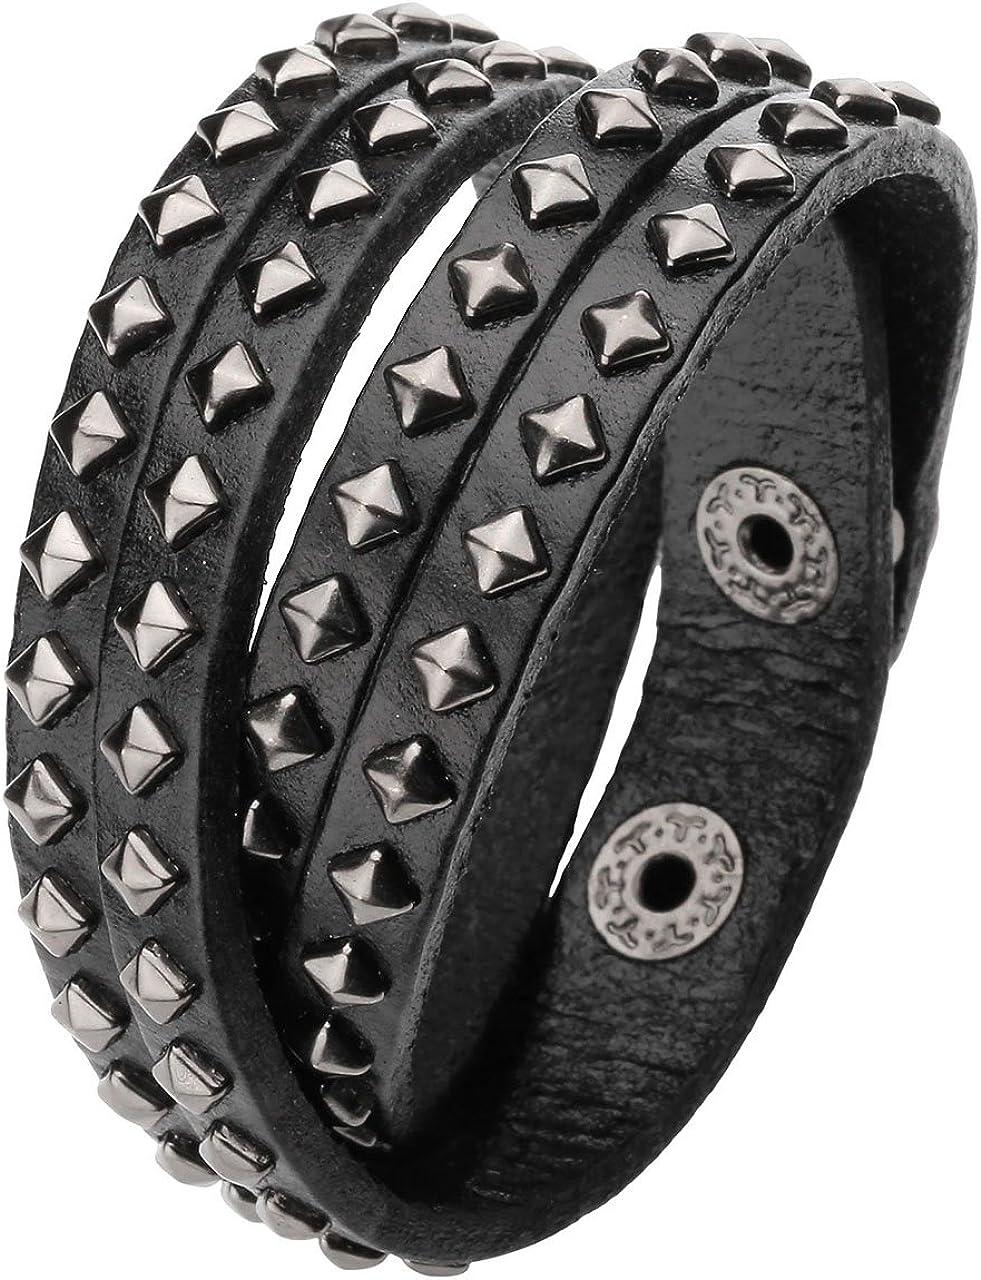 Jovivi Unisex Punk Multi Layers Rivets Strap Cuff Wrap Black Genuine Biker Leather Bracelet Wristband